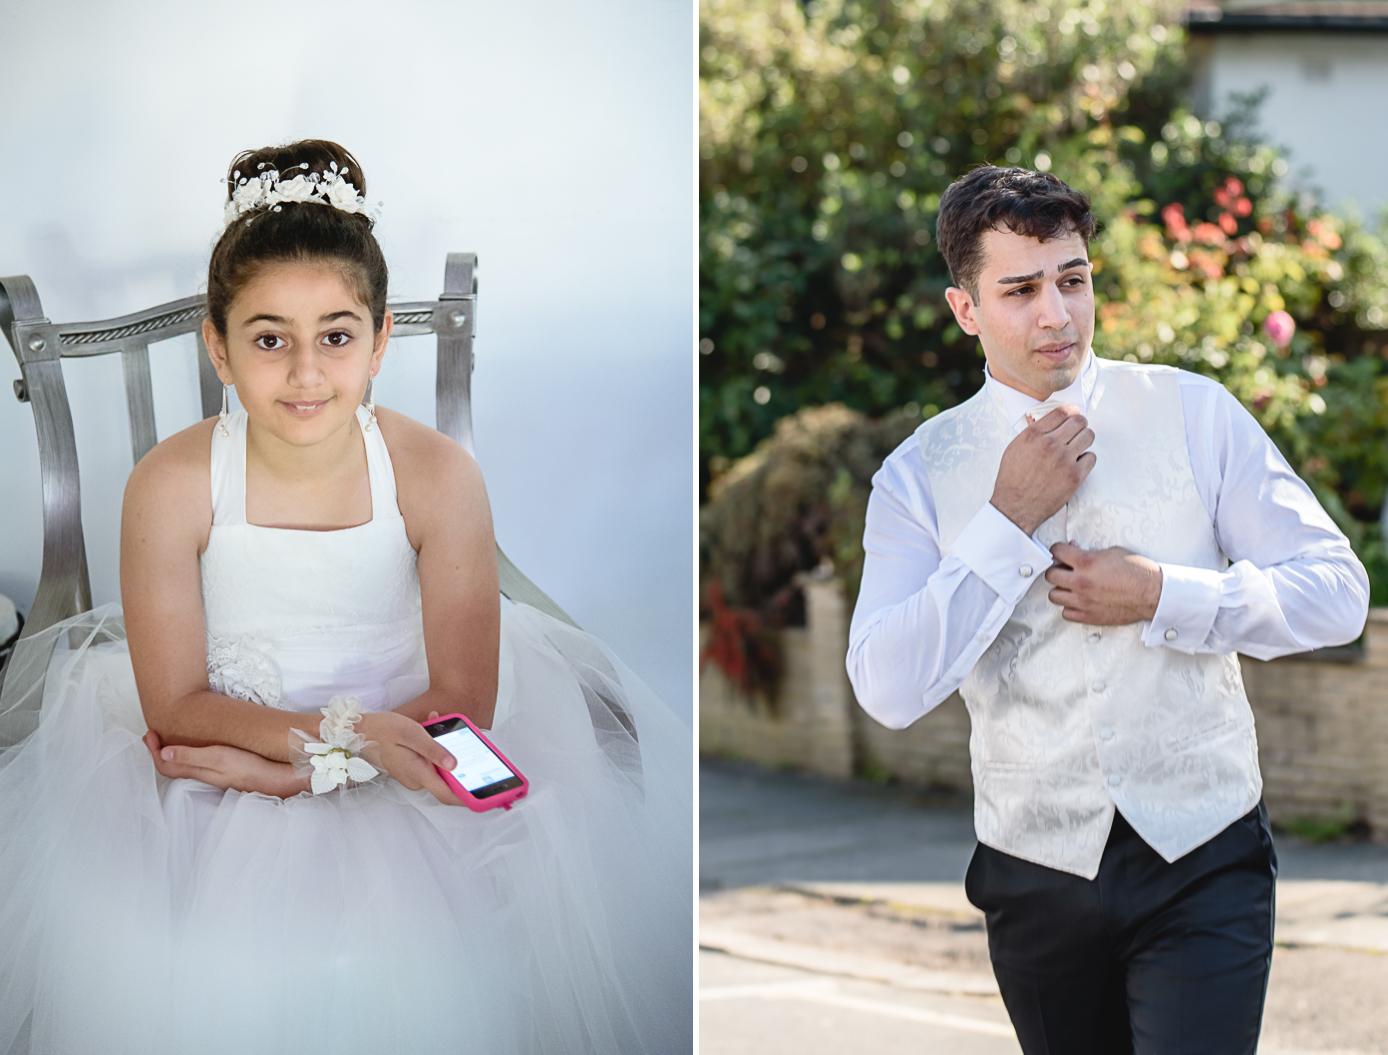 iranian wedding photographer 10 - Drapers Hall London Wedding Photographer